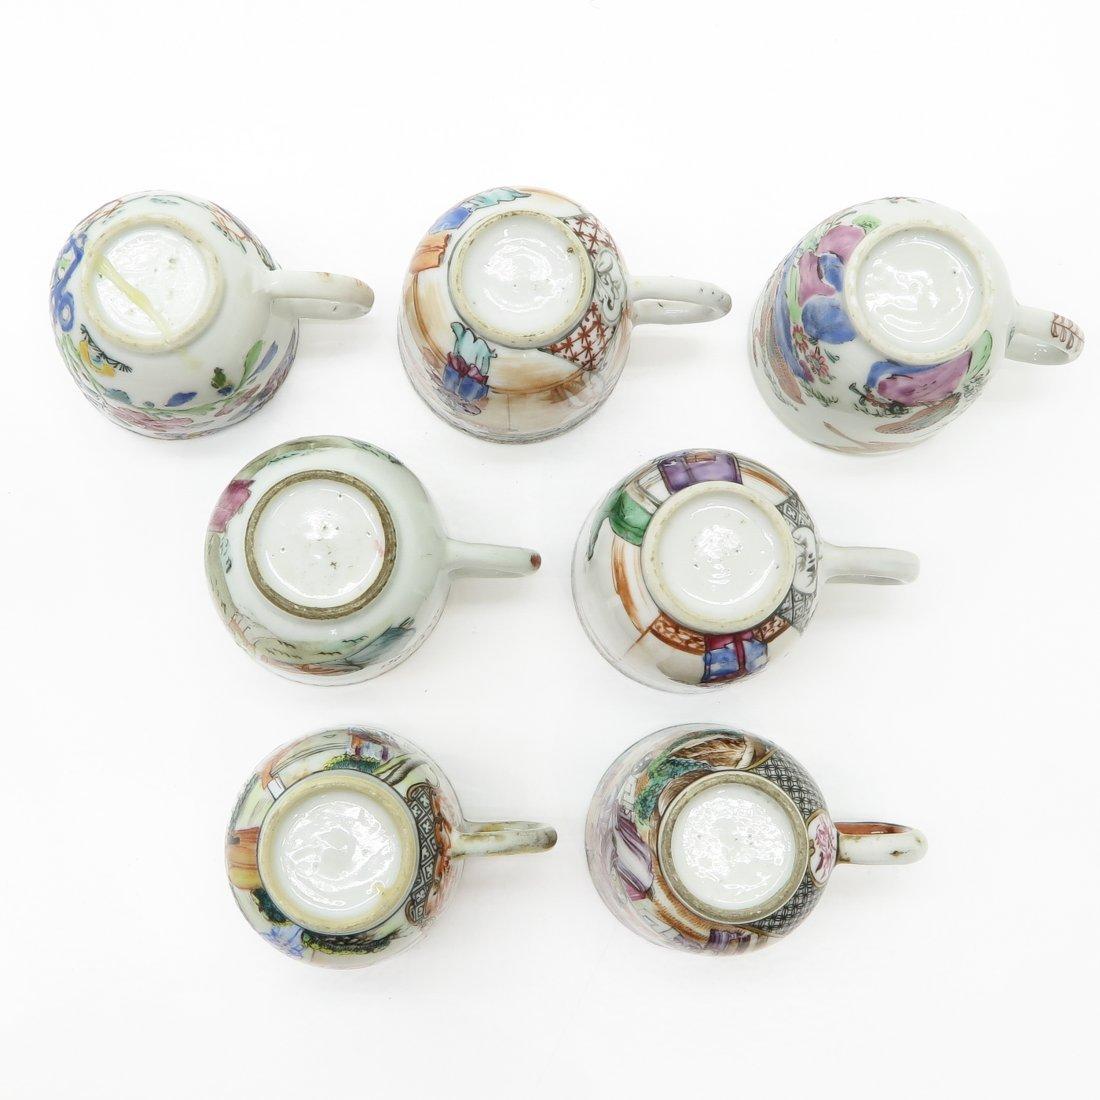 Lot of Mandarin Decor China Porcelain Cups - 3